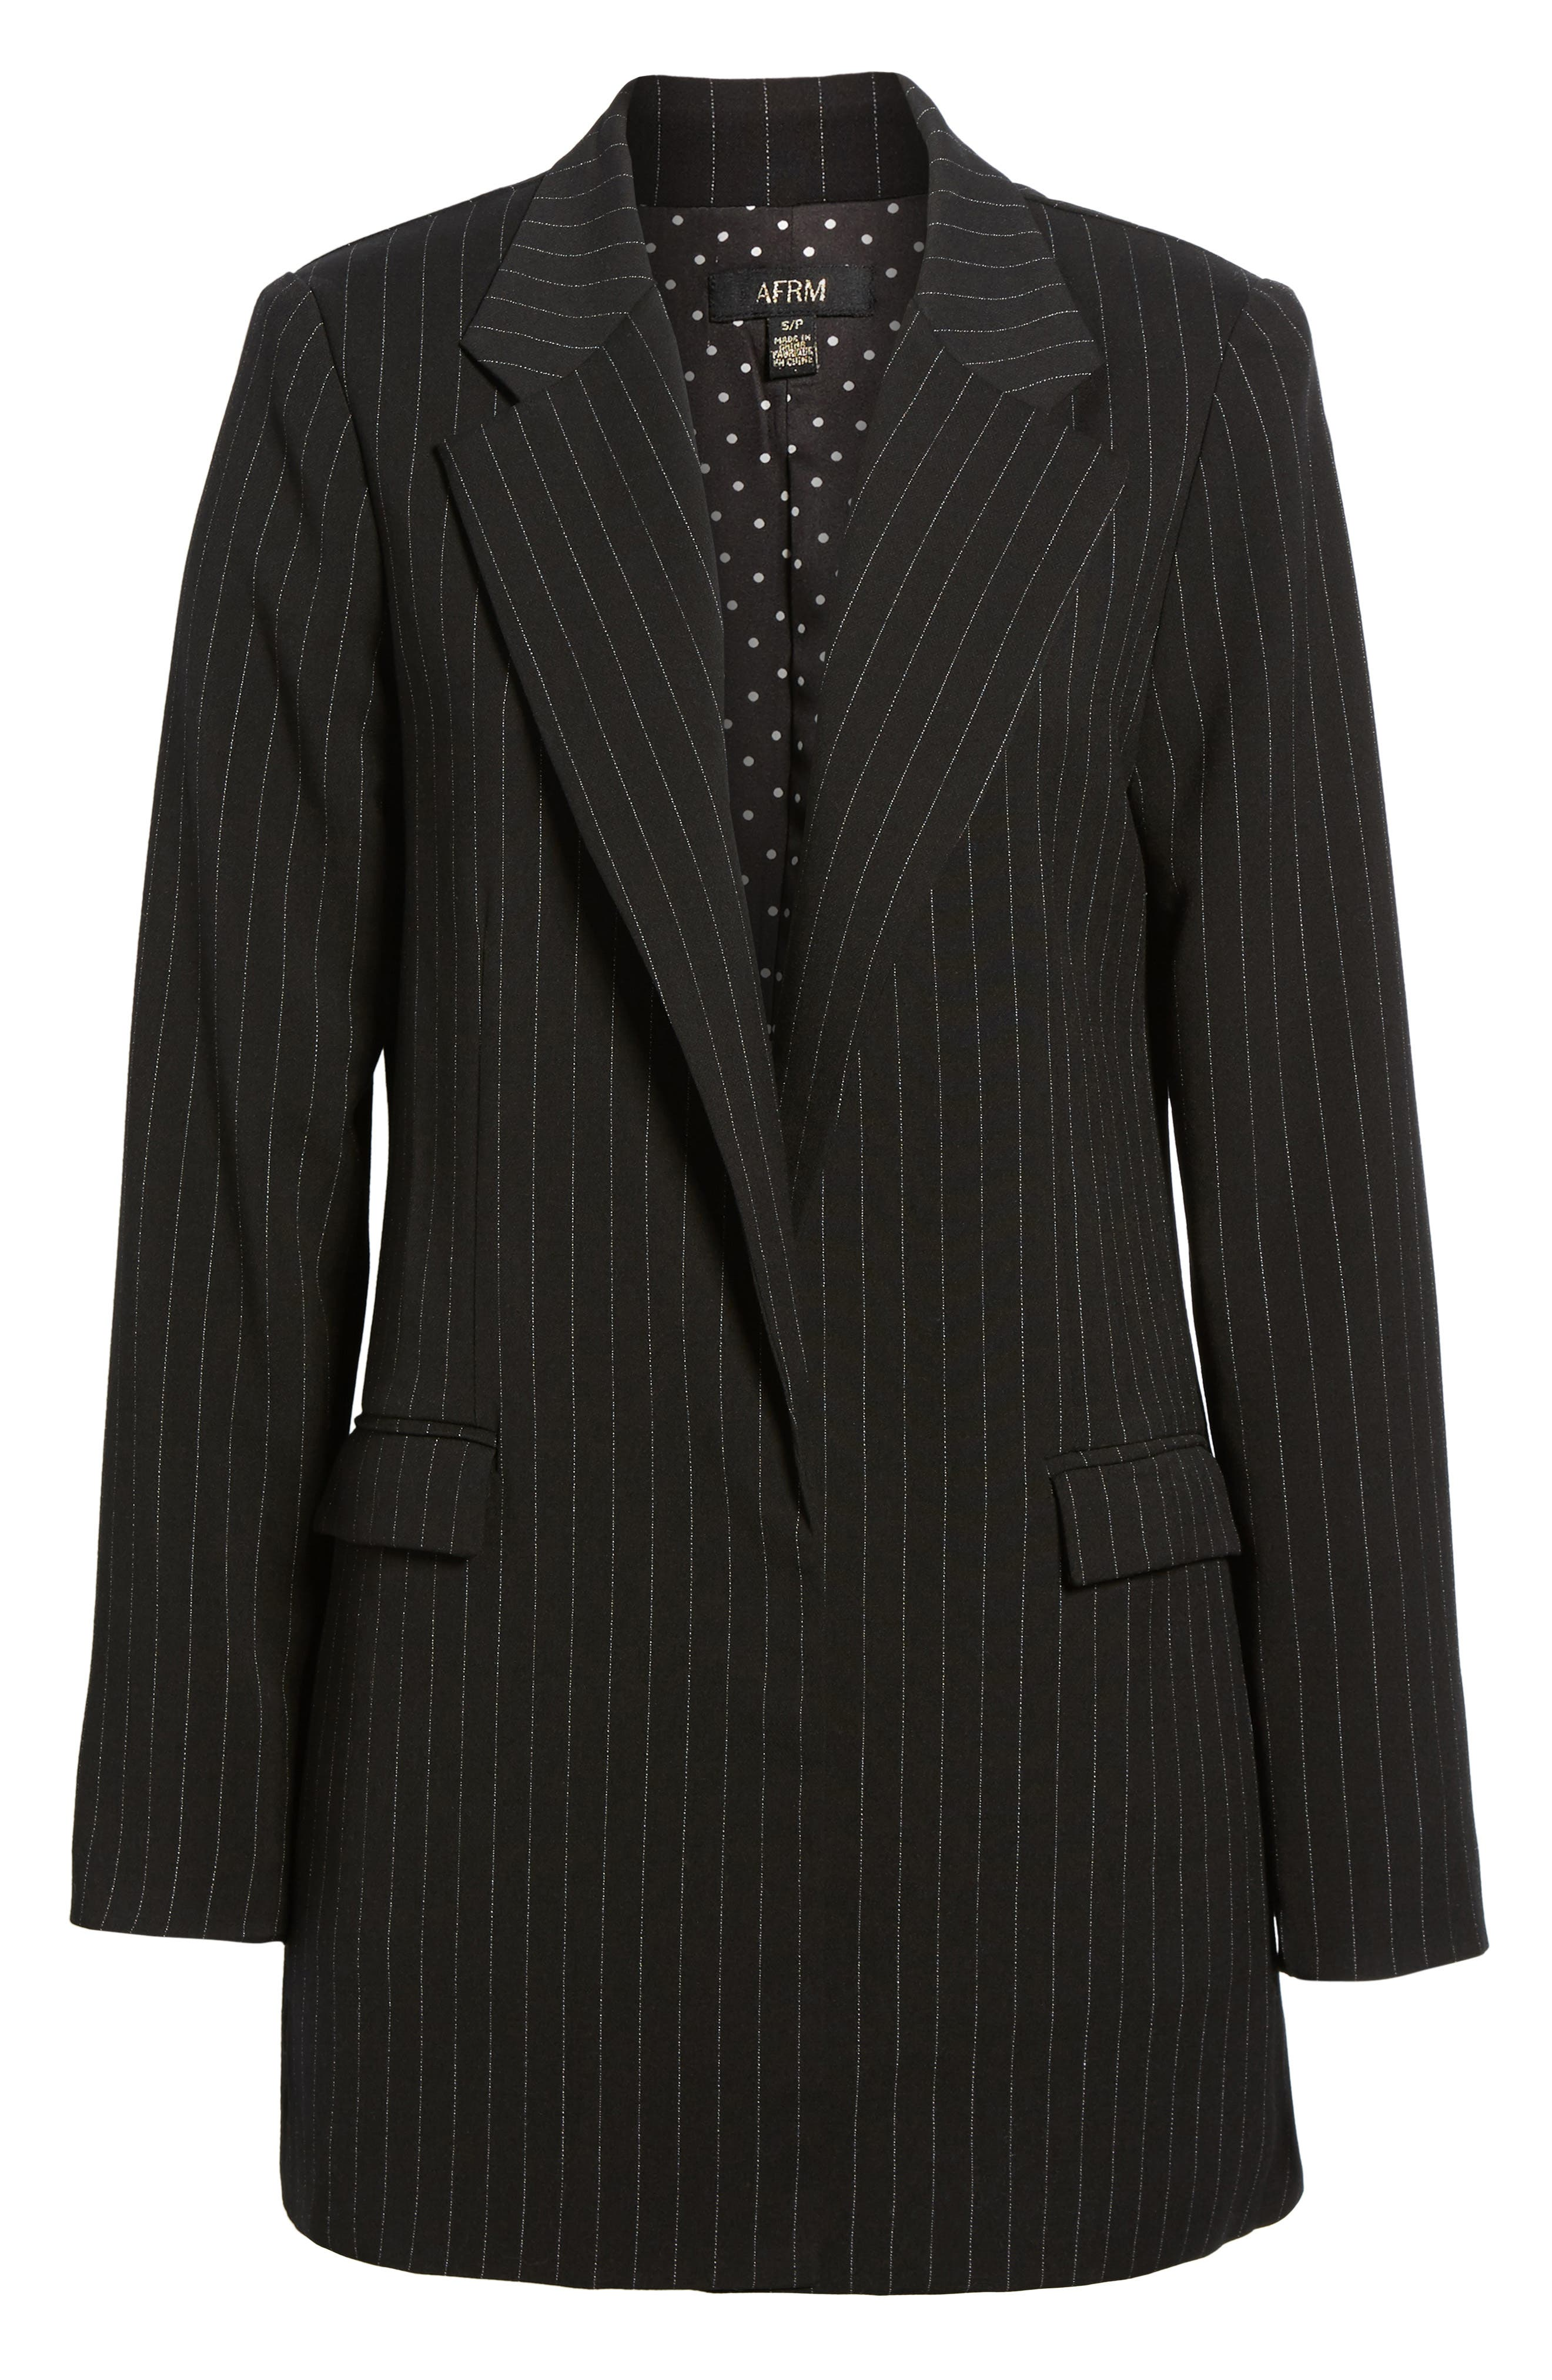 Nova Oversize Blazer,                             Alternate thumbnail 6, color,                             Menswear Suiting